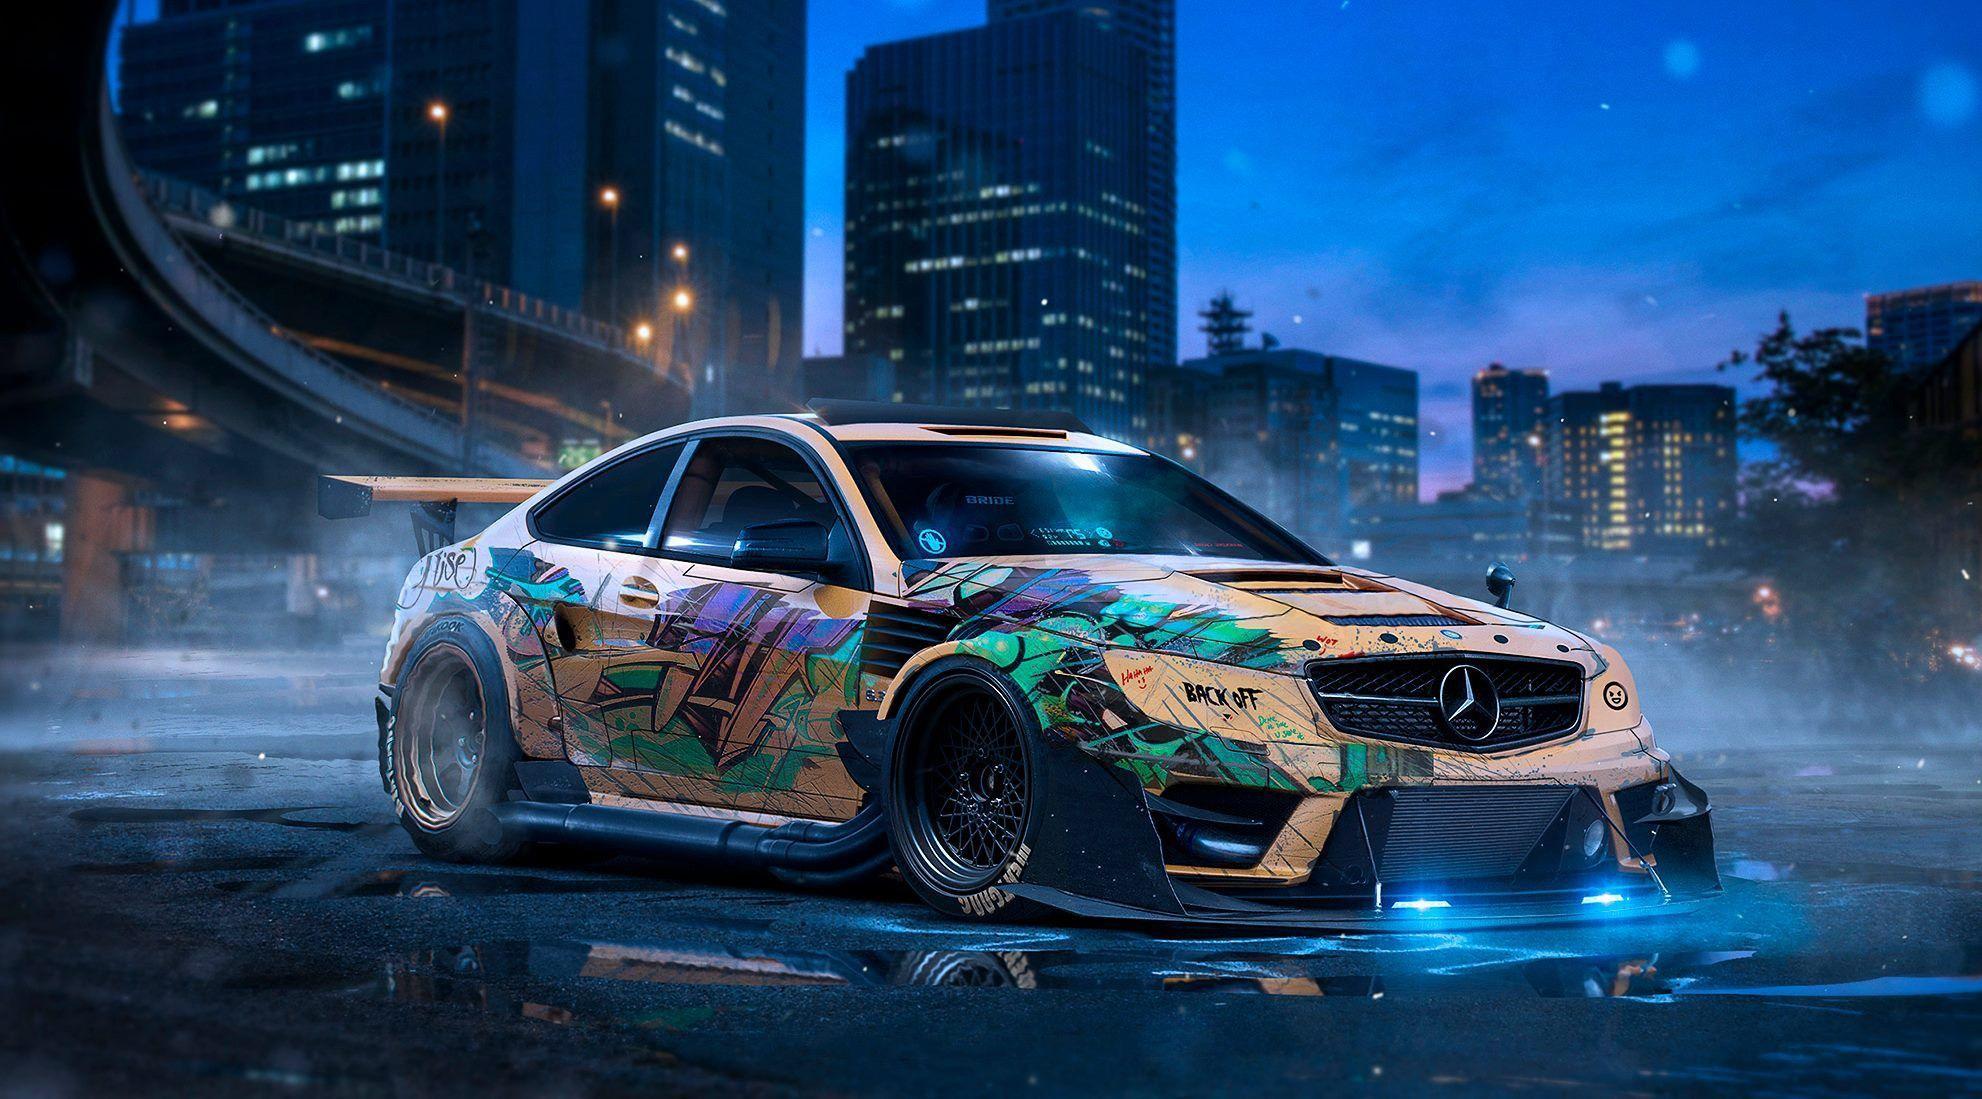 Drift Cars Wallpapers - Top Free Drift Cars Backgrounds